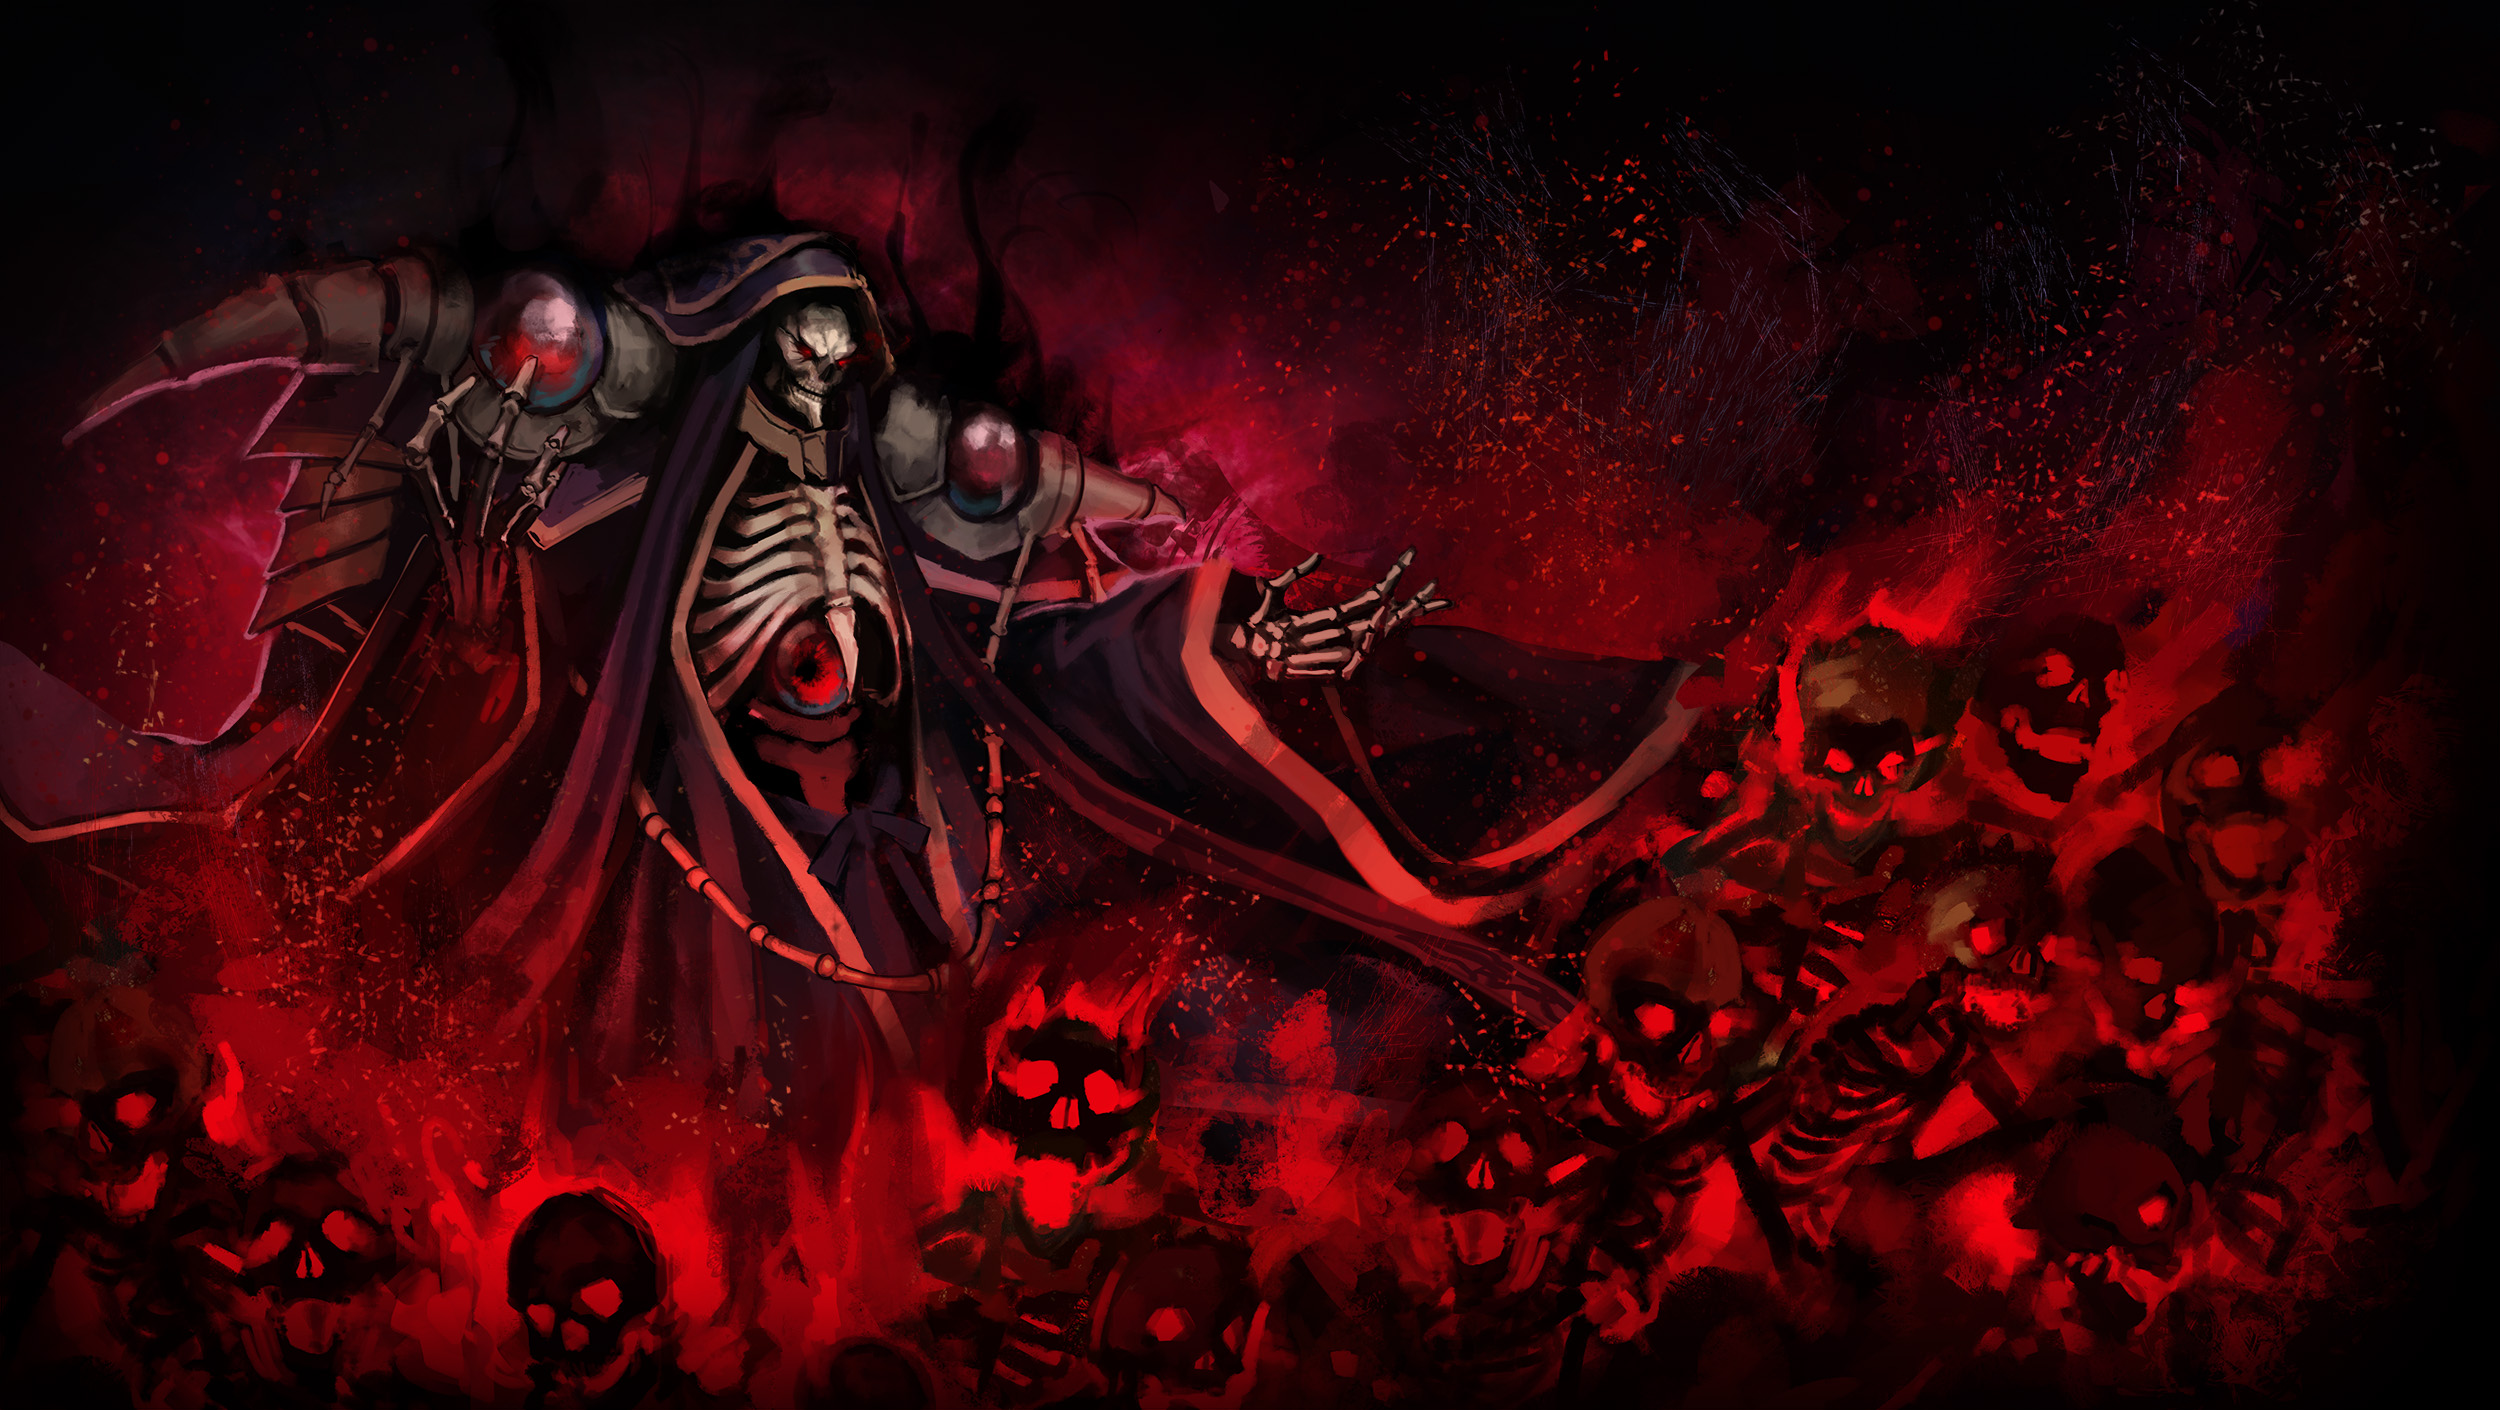 Anime 2500x1410 anime TunaMaYo Overlord (anime) Ainz Ooal Gown skeleton undead